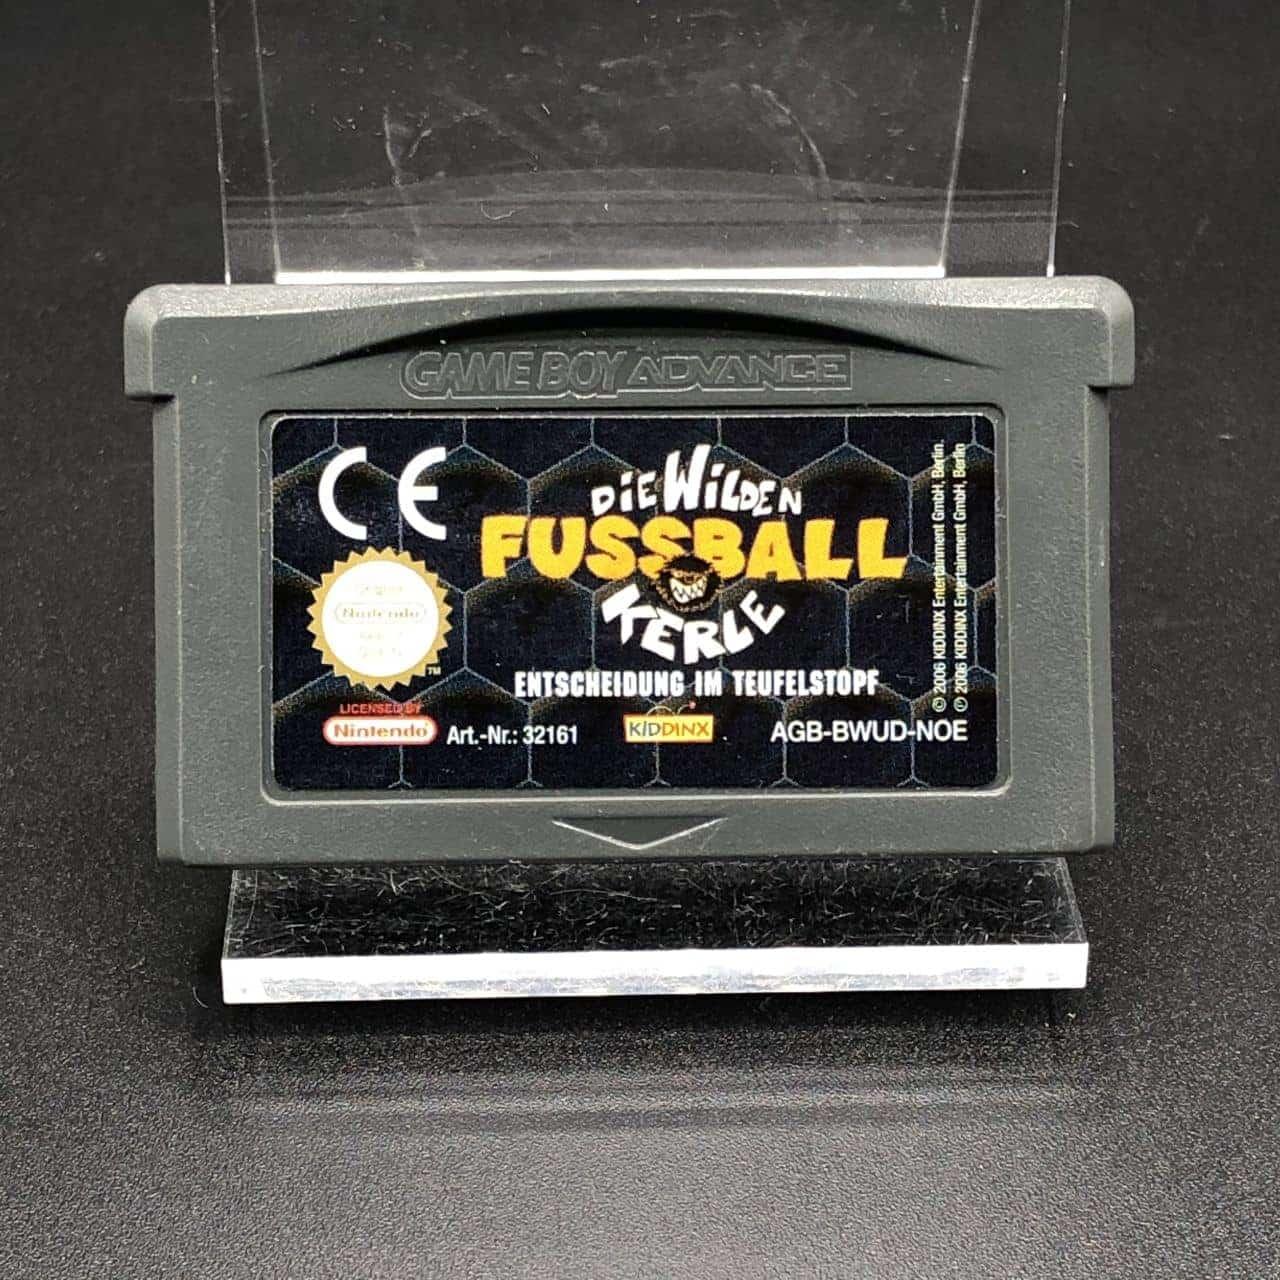 GBA Die Wilden Fußball Kerle: Entscheidung im Teufelstopf (Modul) (Gut) Nintendo Game Boy Advance